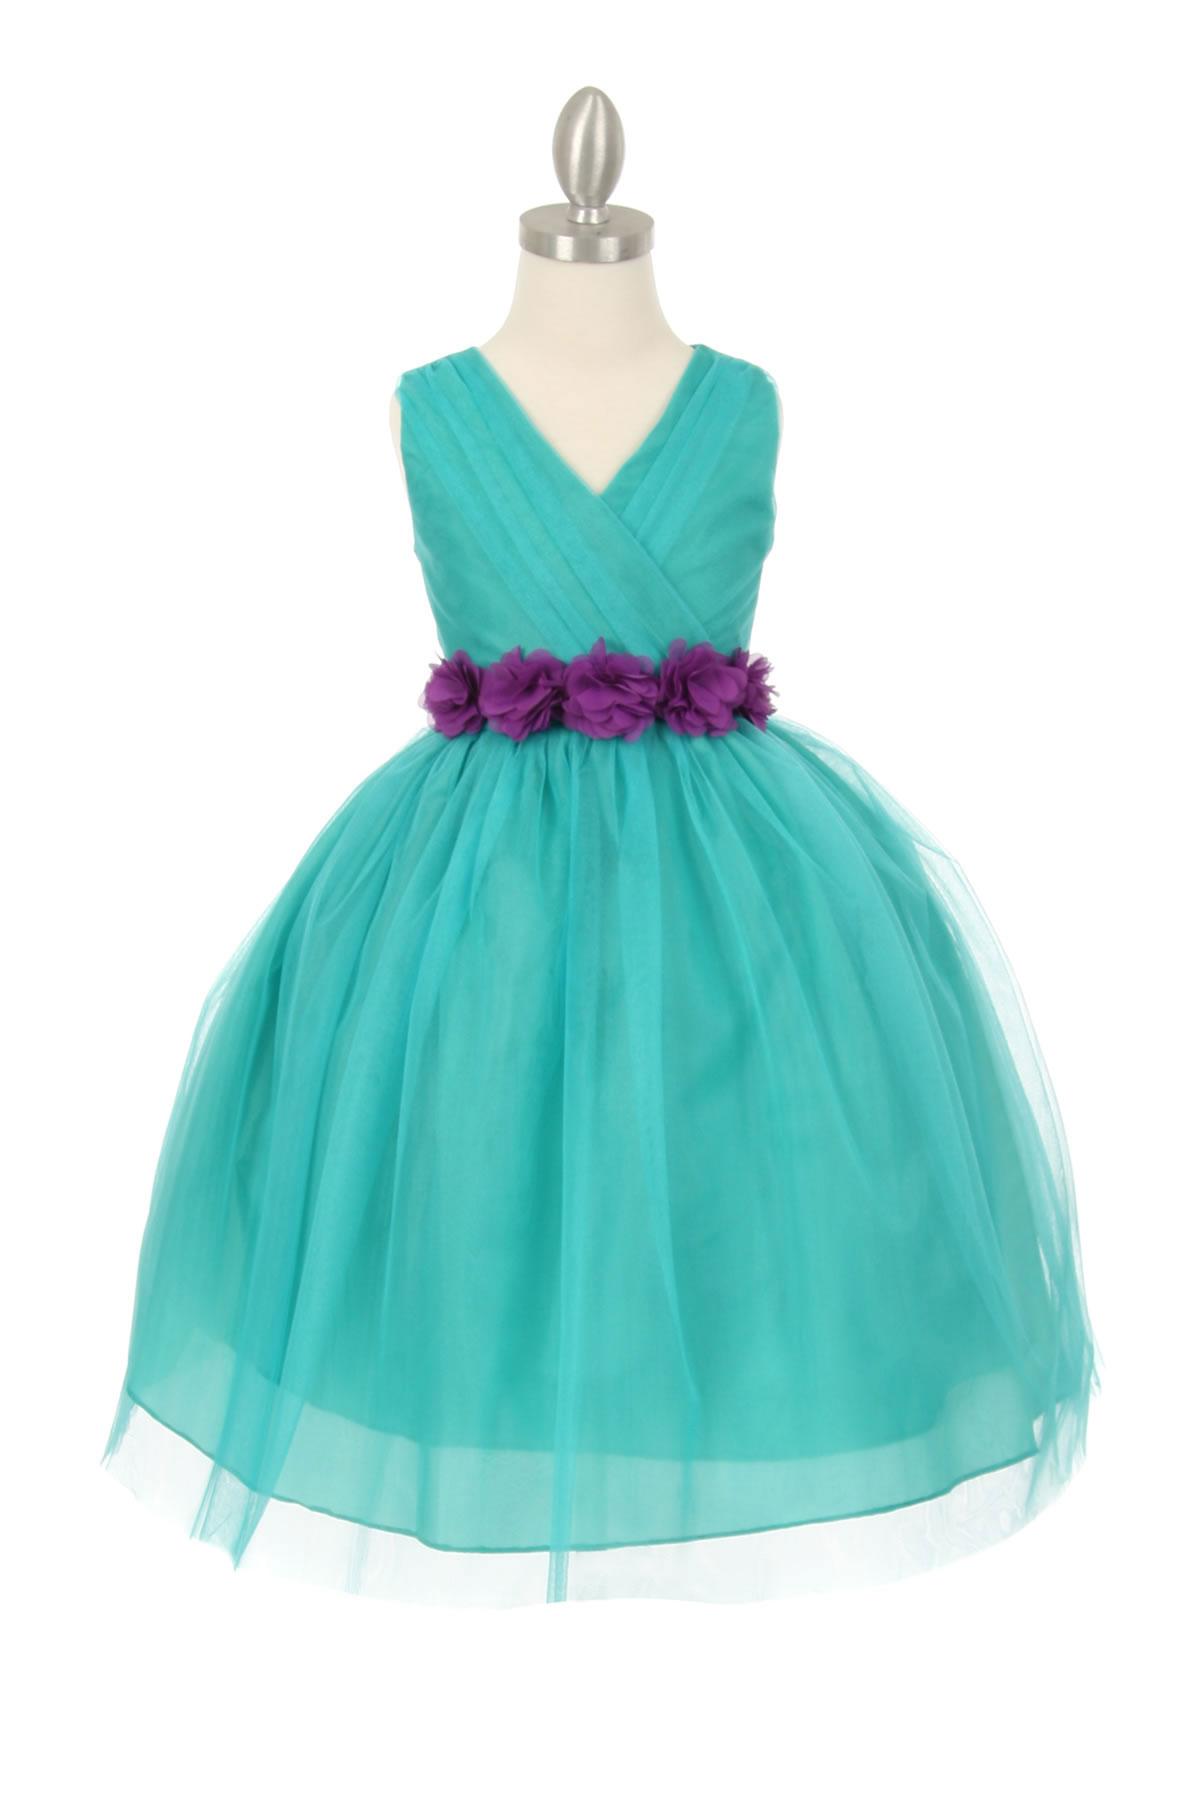 CC 1220JDPUR Girls Dress Style 1220 JADE Dress with 14 Sash Options See